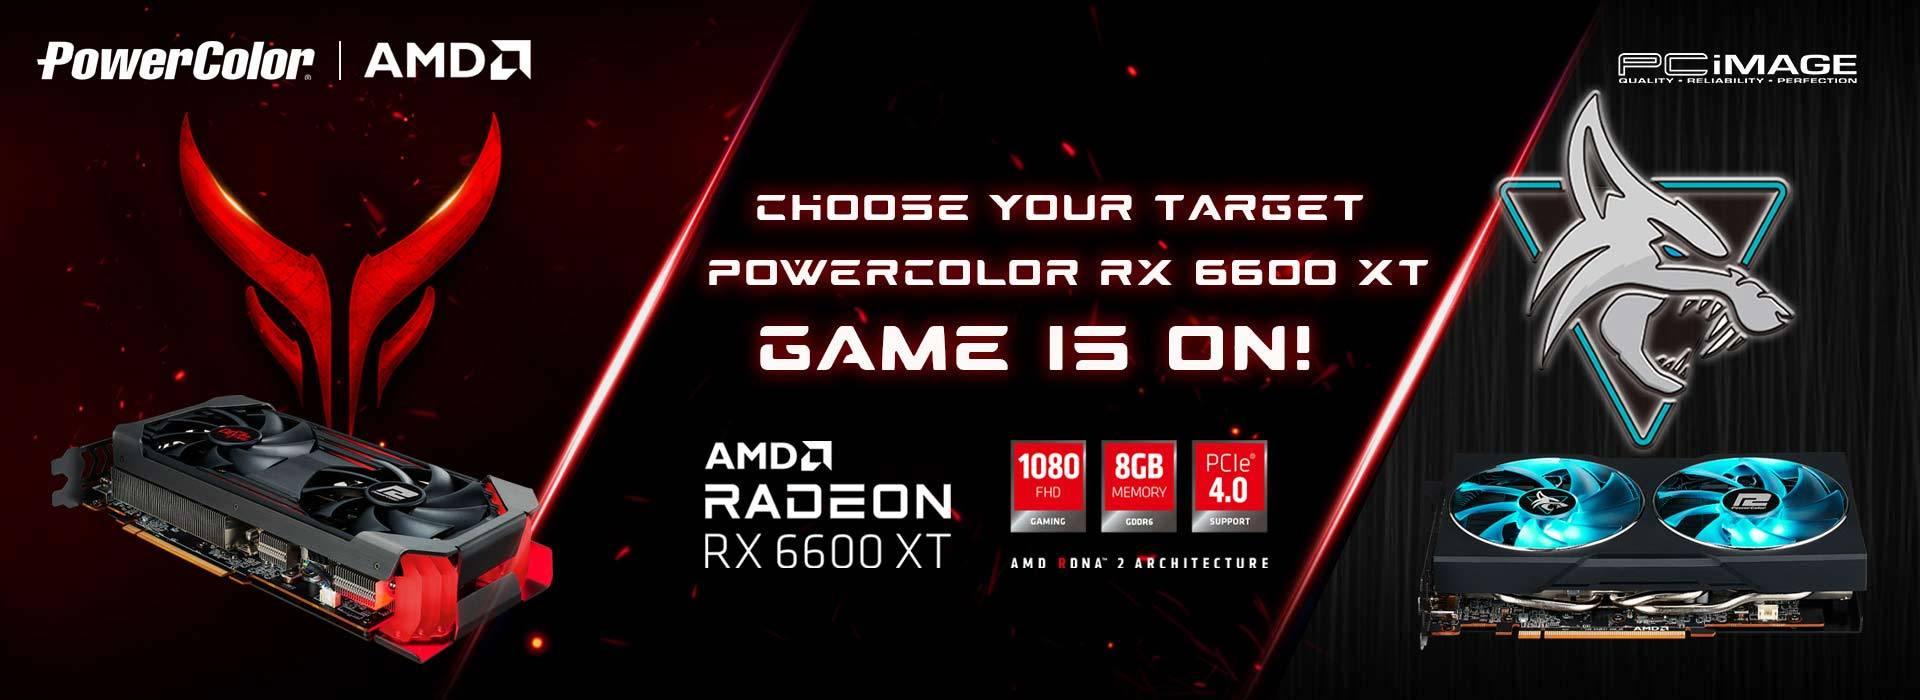 Powercolor AMD RADEON RX 6600XT